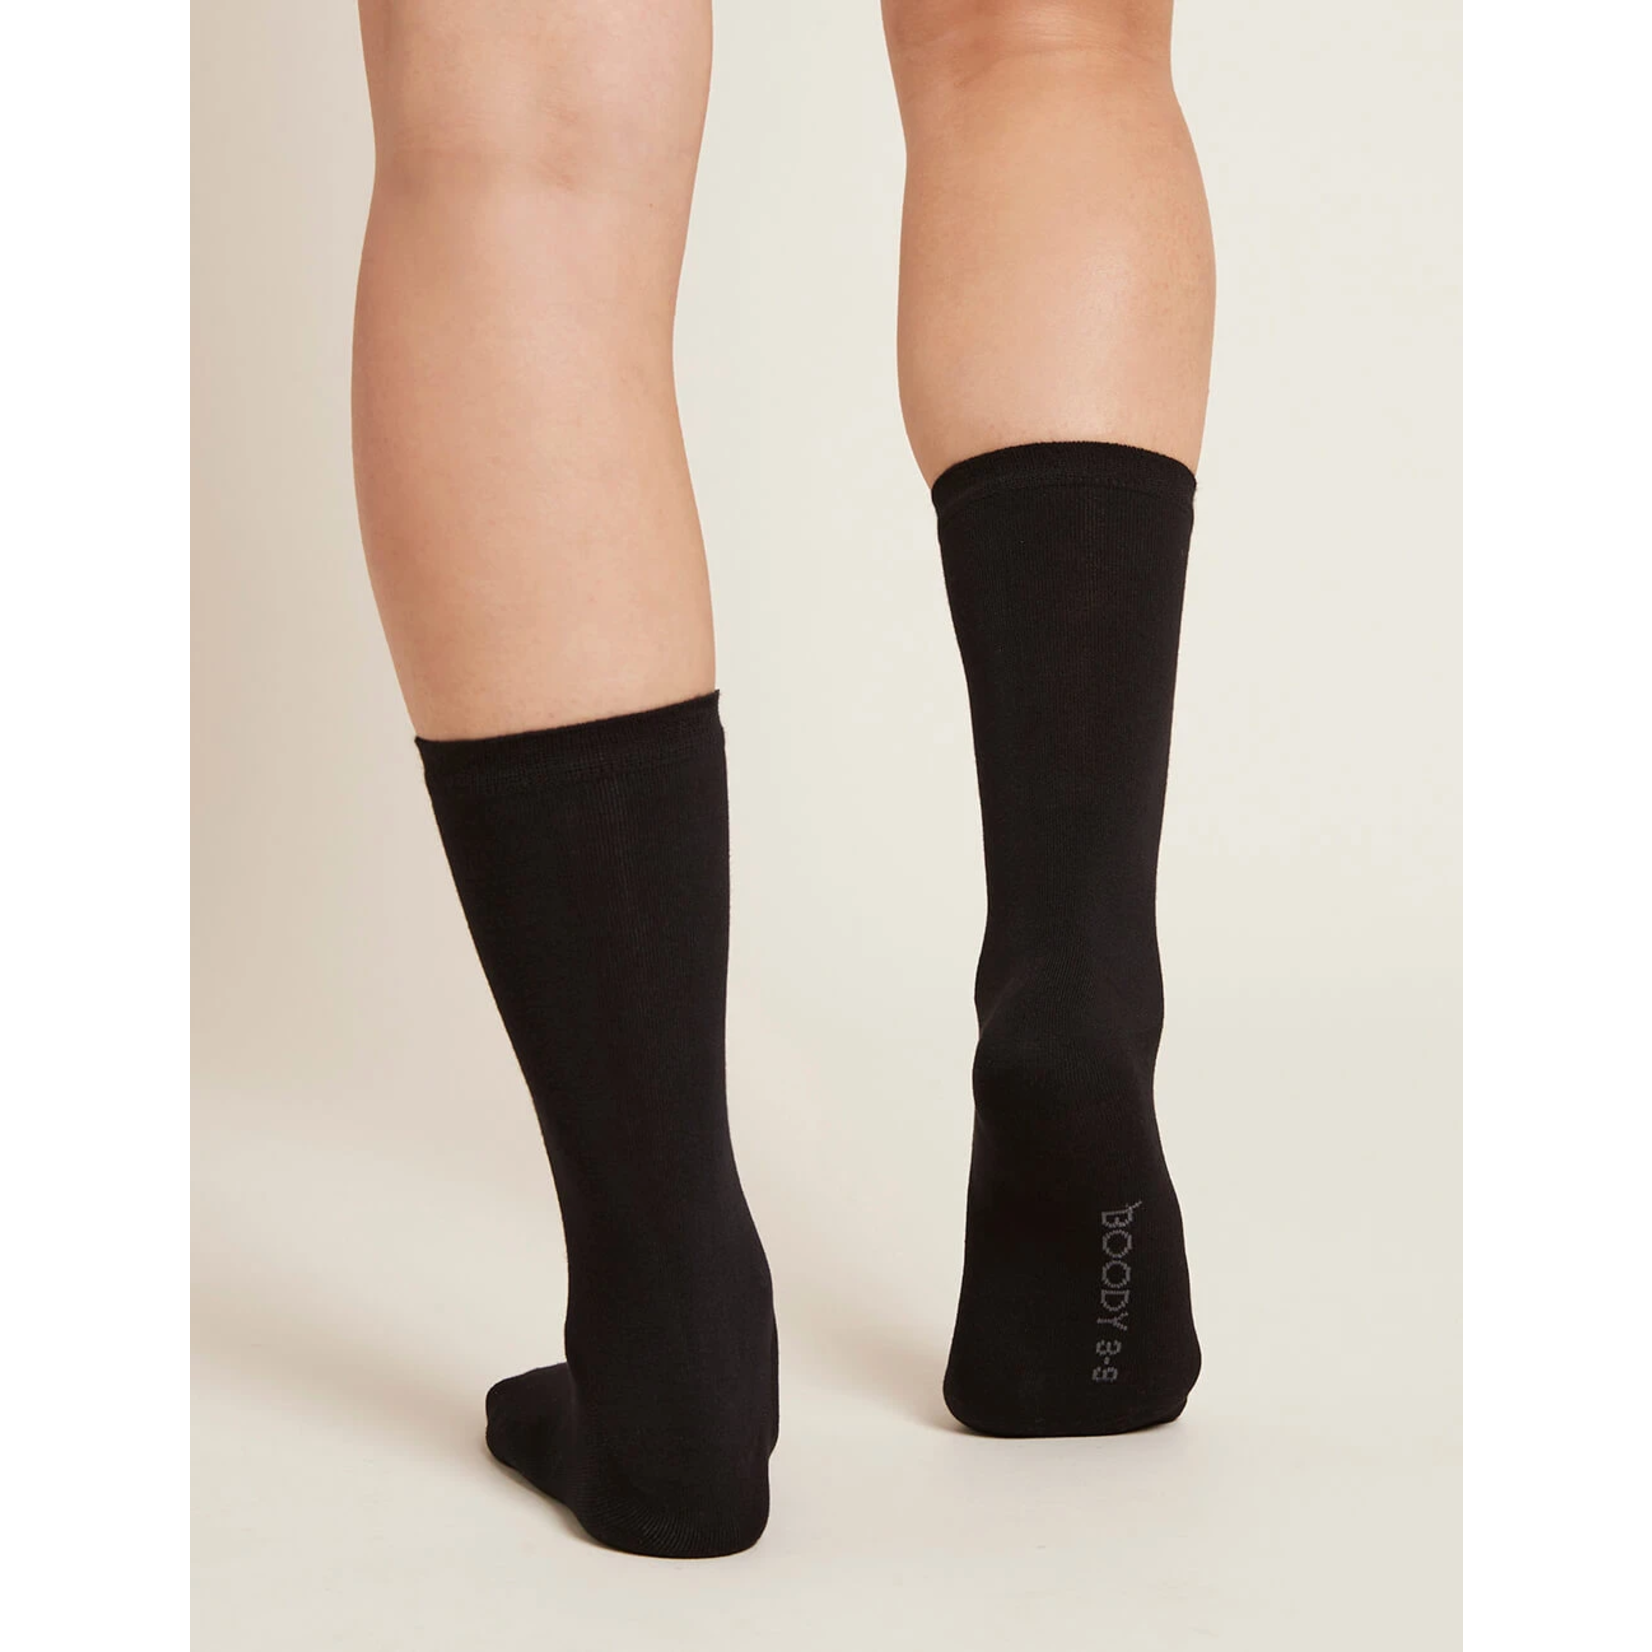 Boody Boody Women's Everyday Sock Black